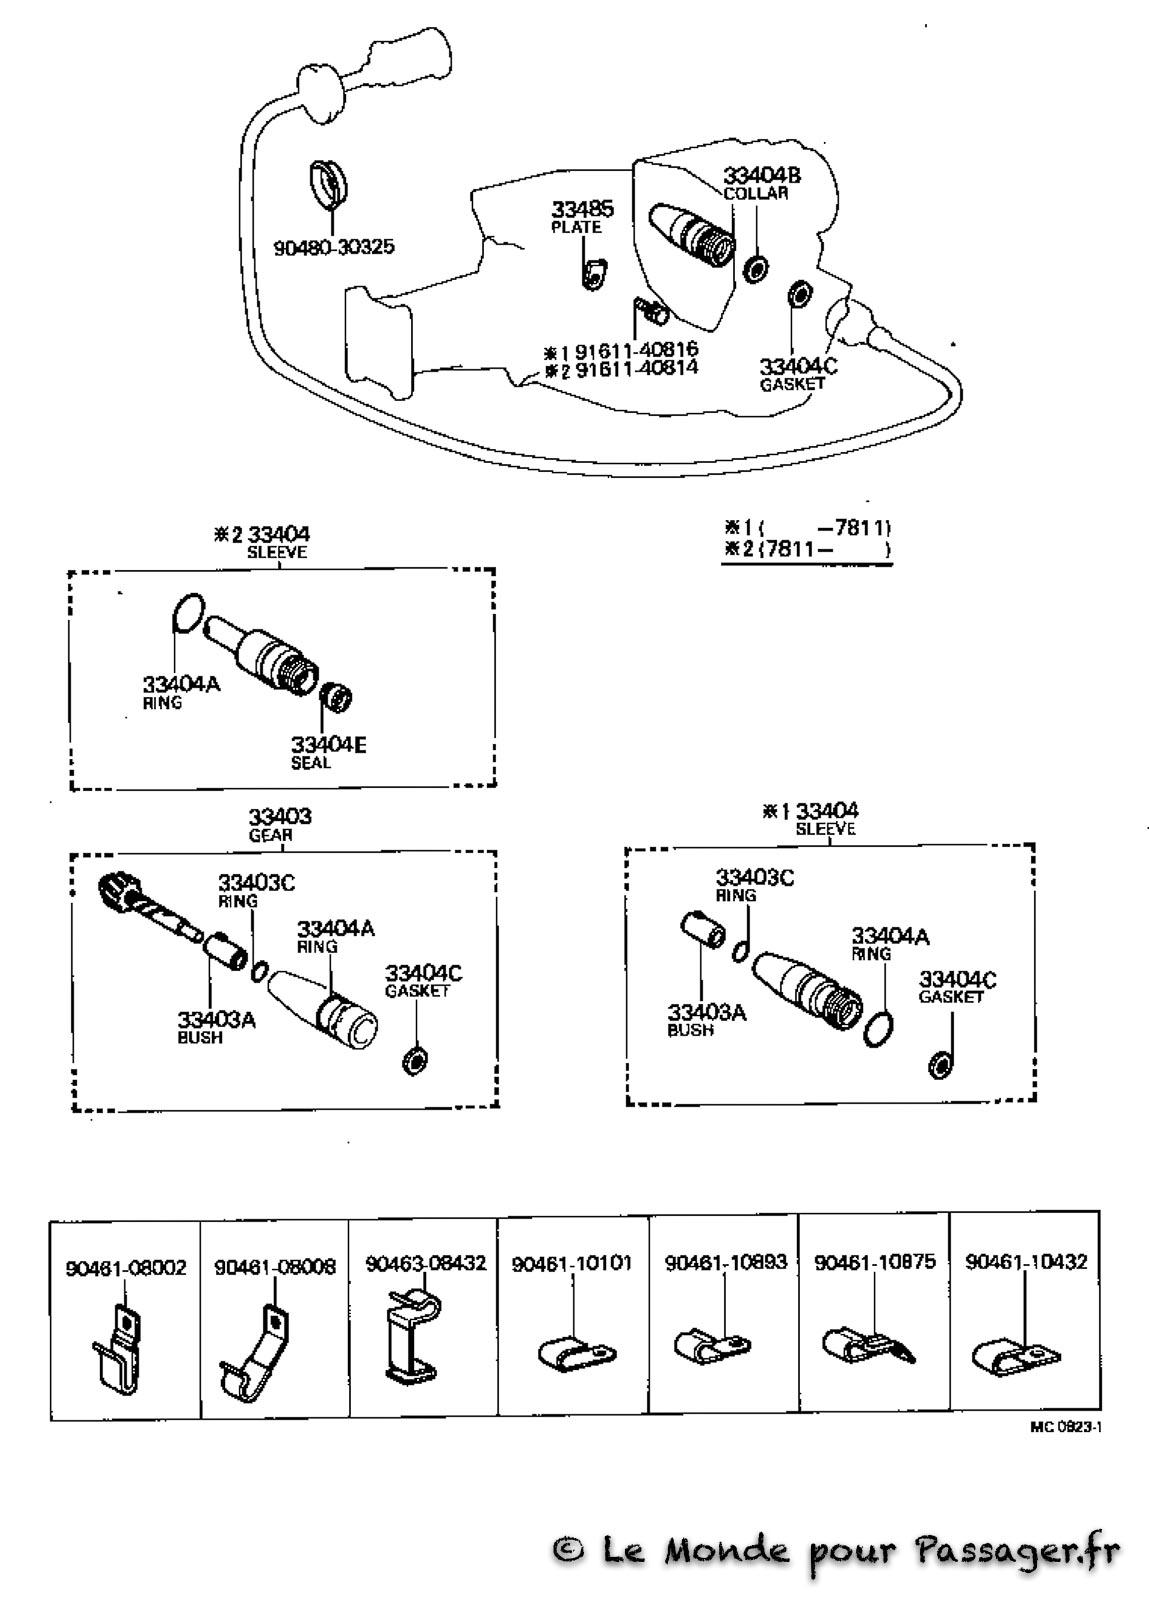 Fj55-Eclatés-Techniques090